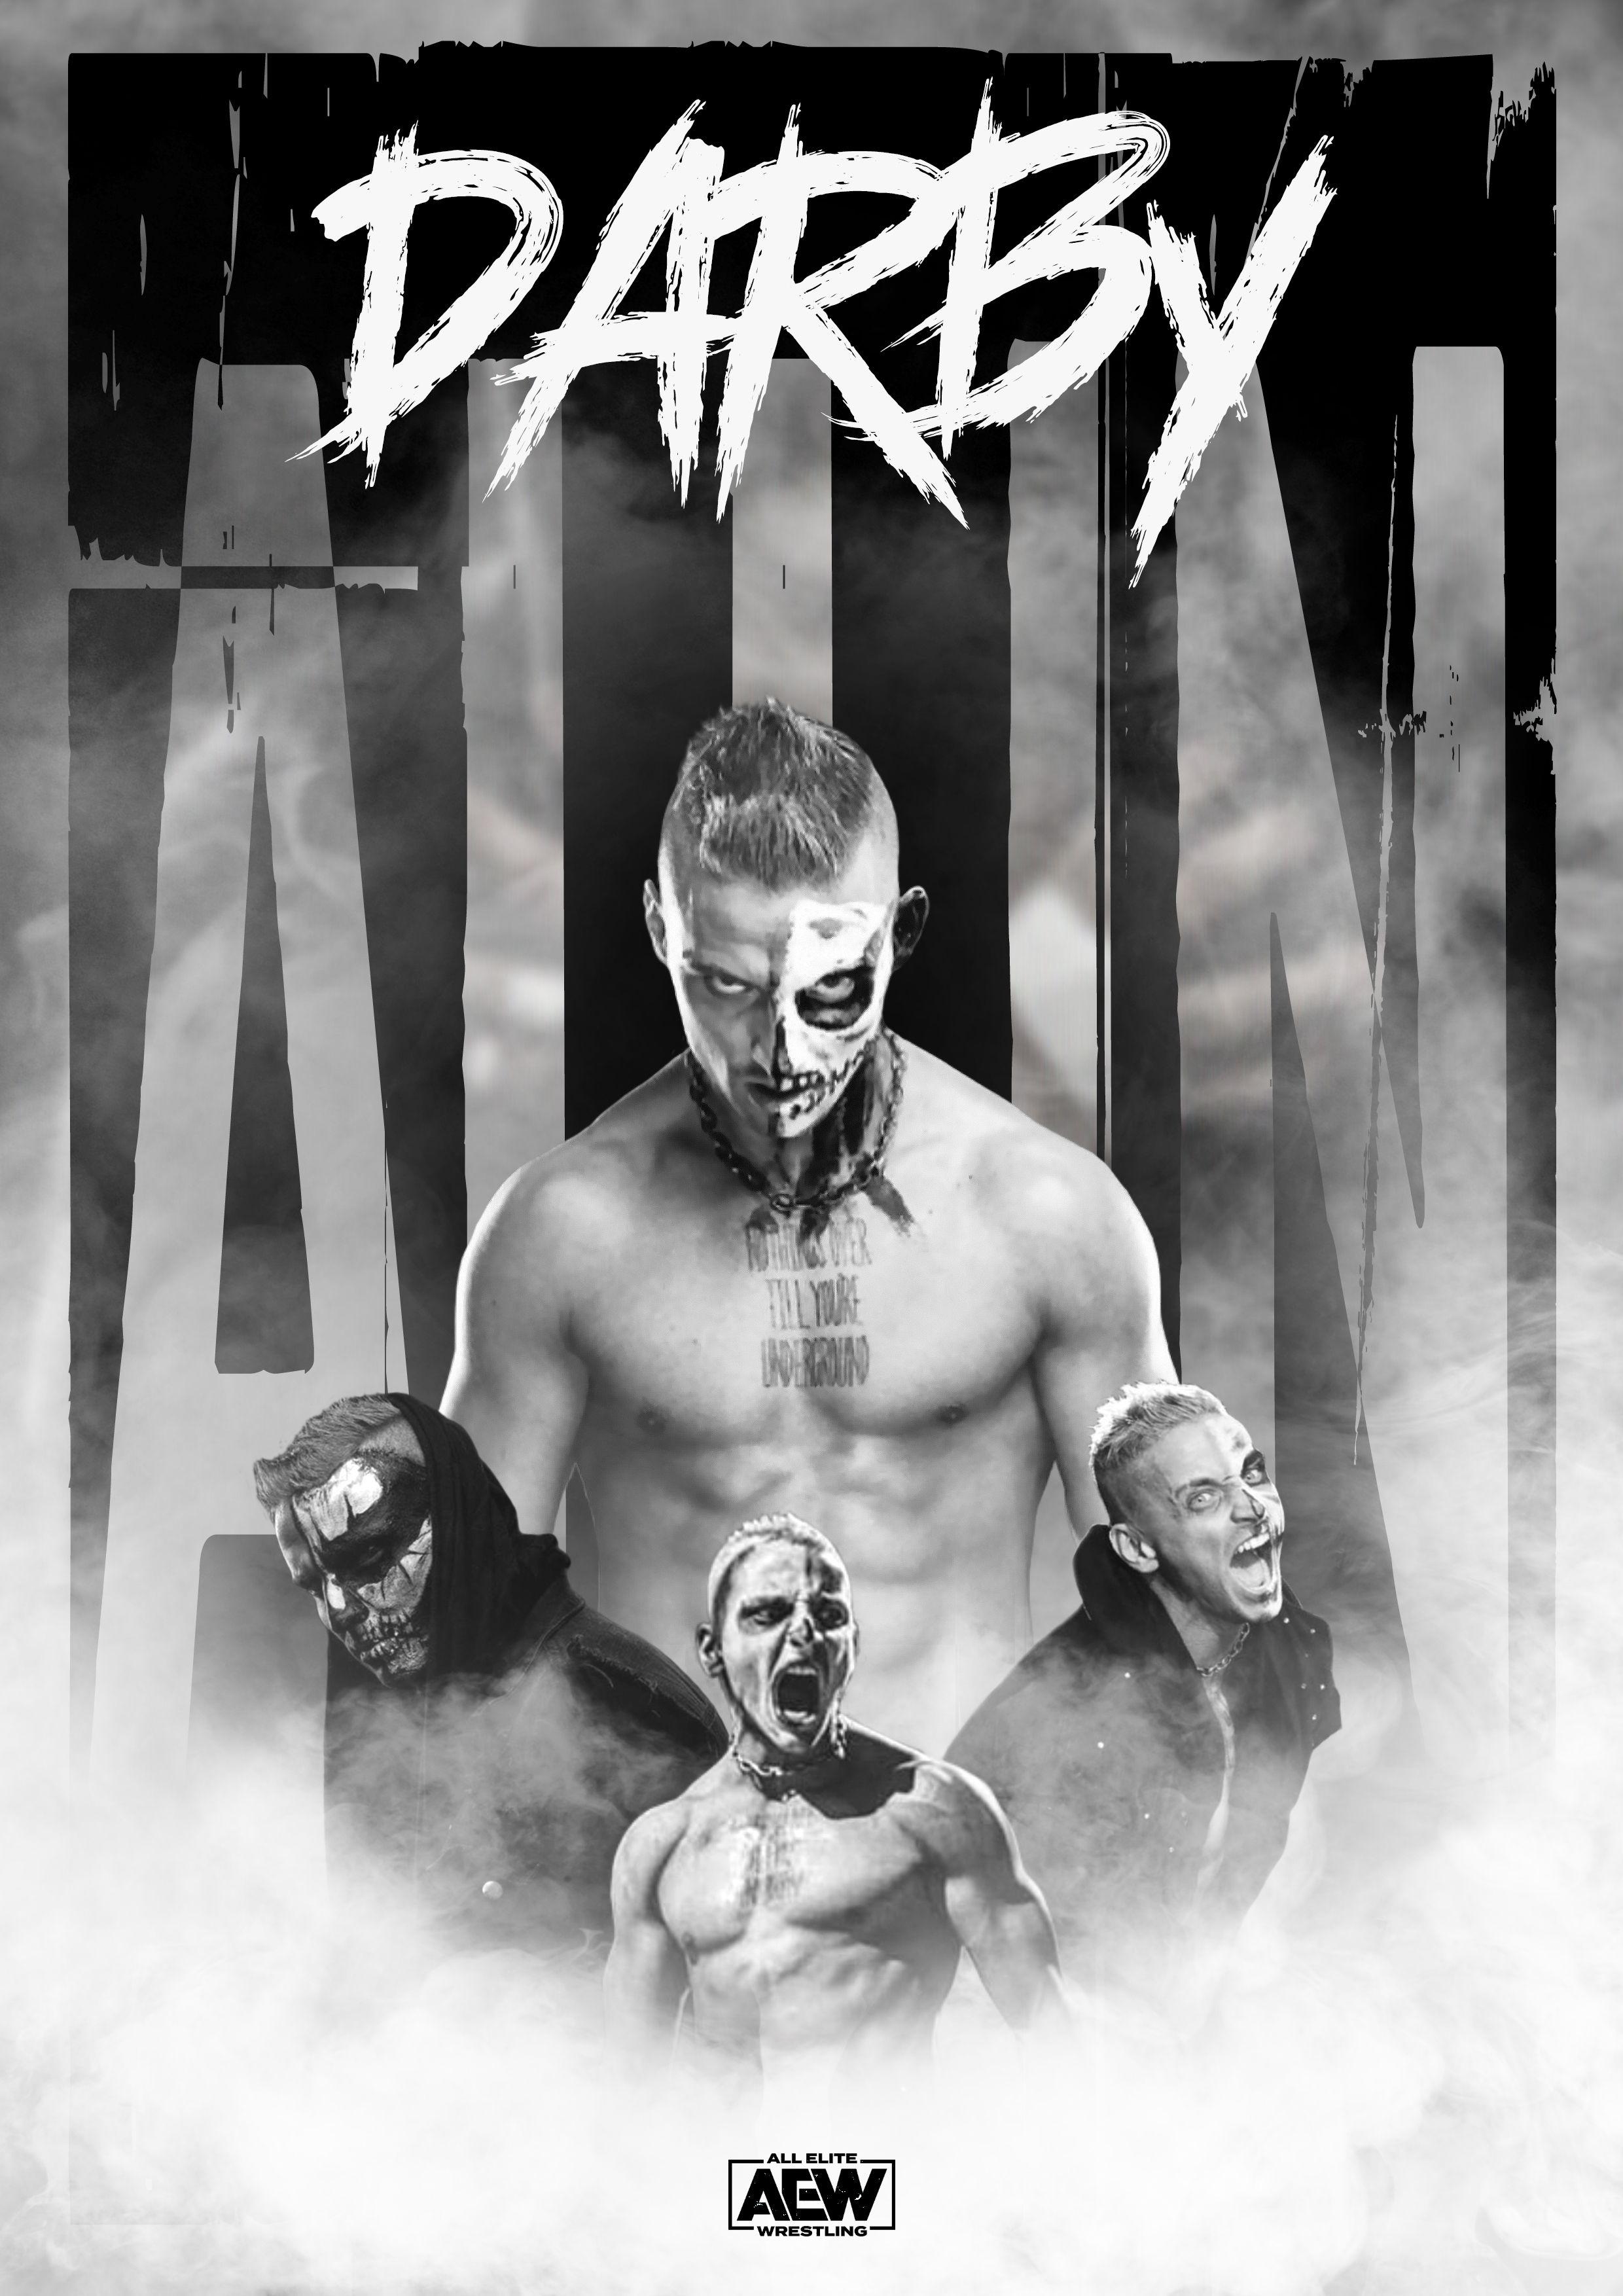 Aew Darby Allin Darbyallin Aew Allelitewrestling Prowrestling Wrestling Photoshop Poster Wallpaper Wrestling Stars Pro Wrestling Njpw